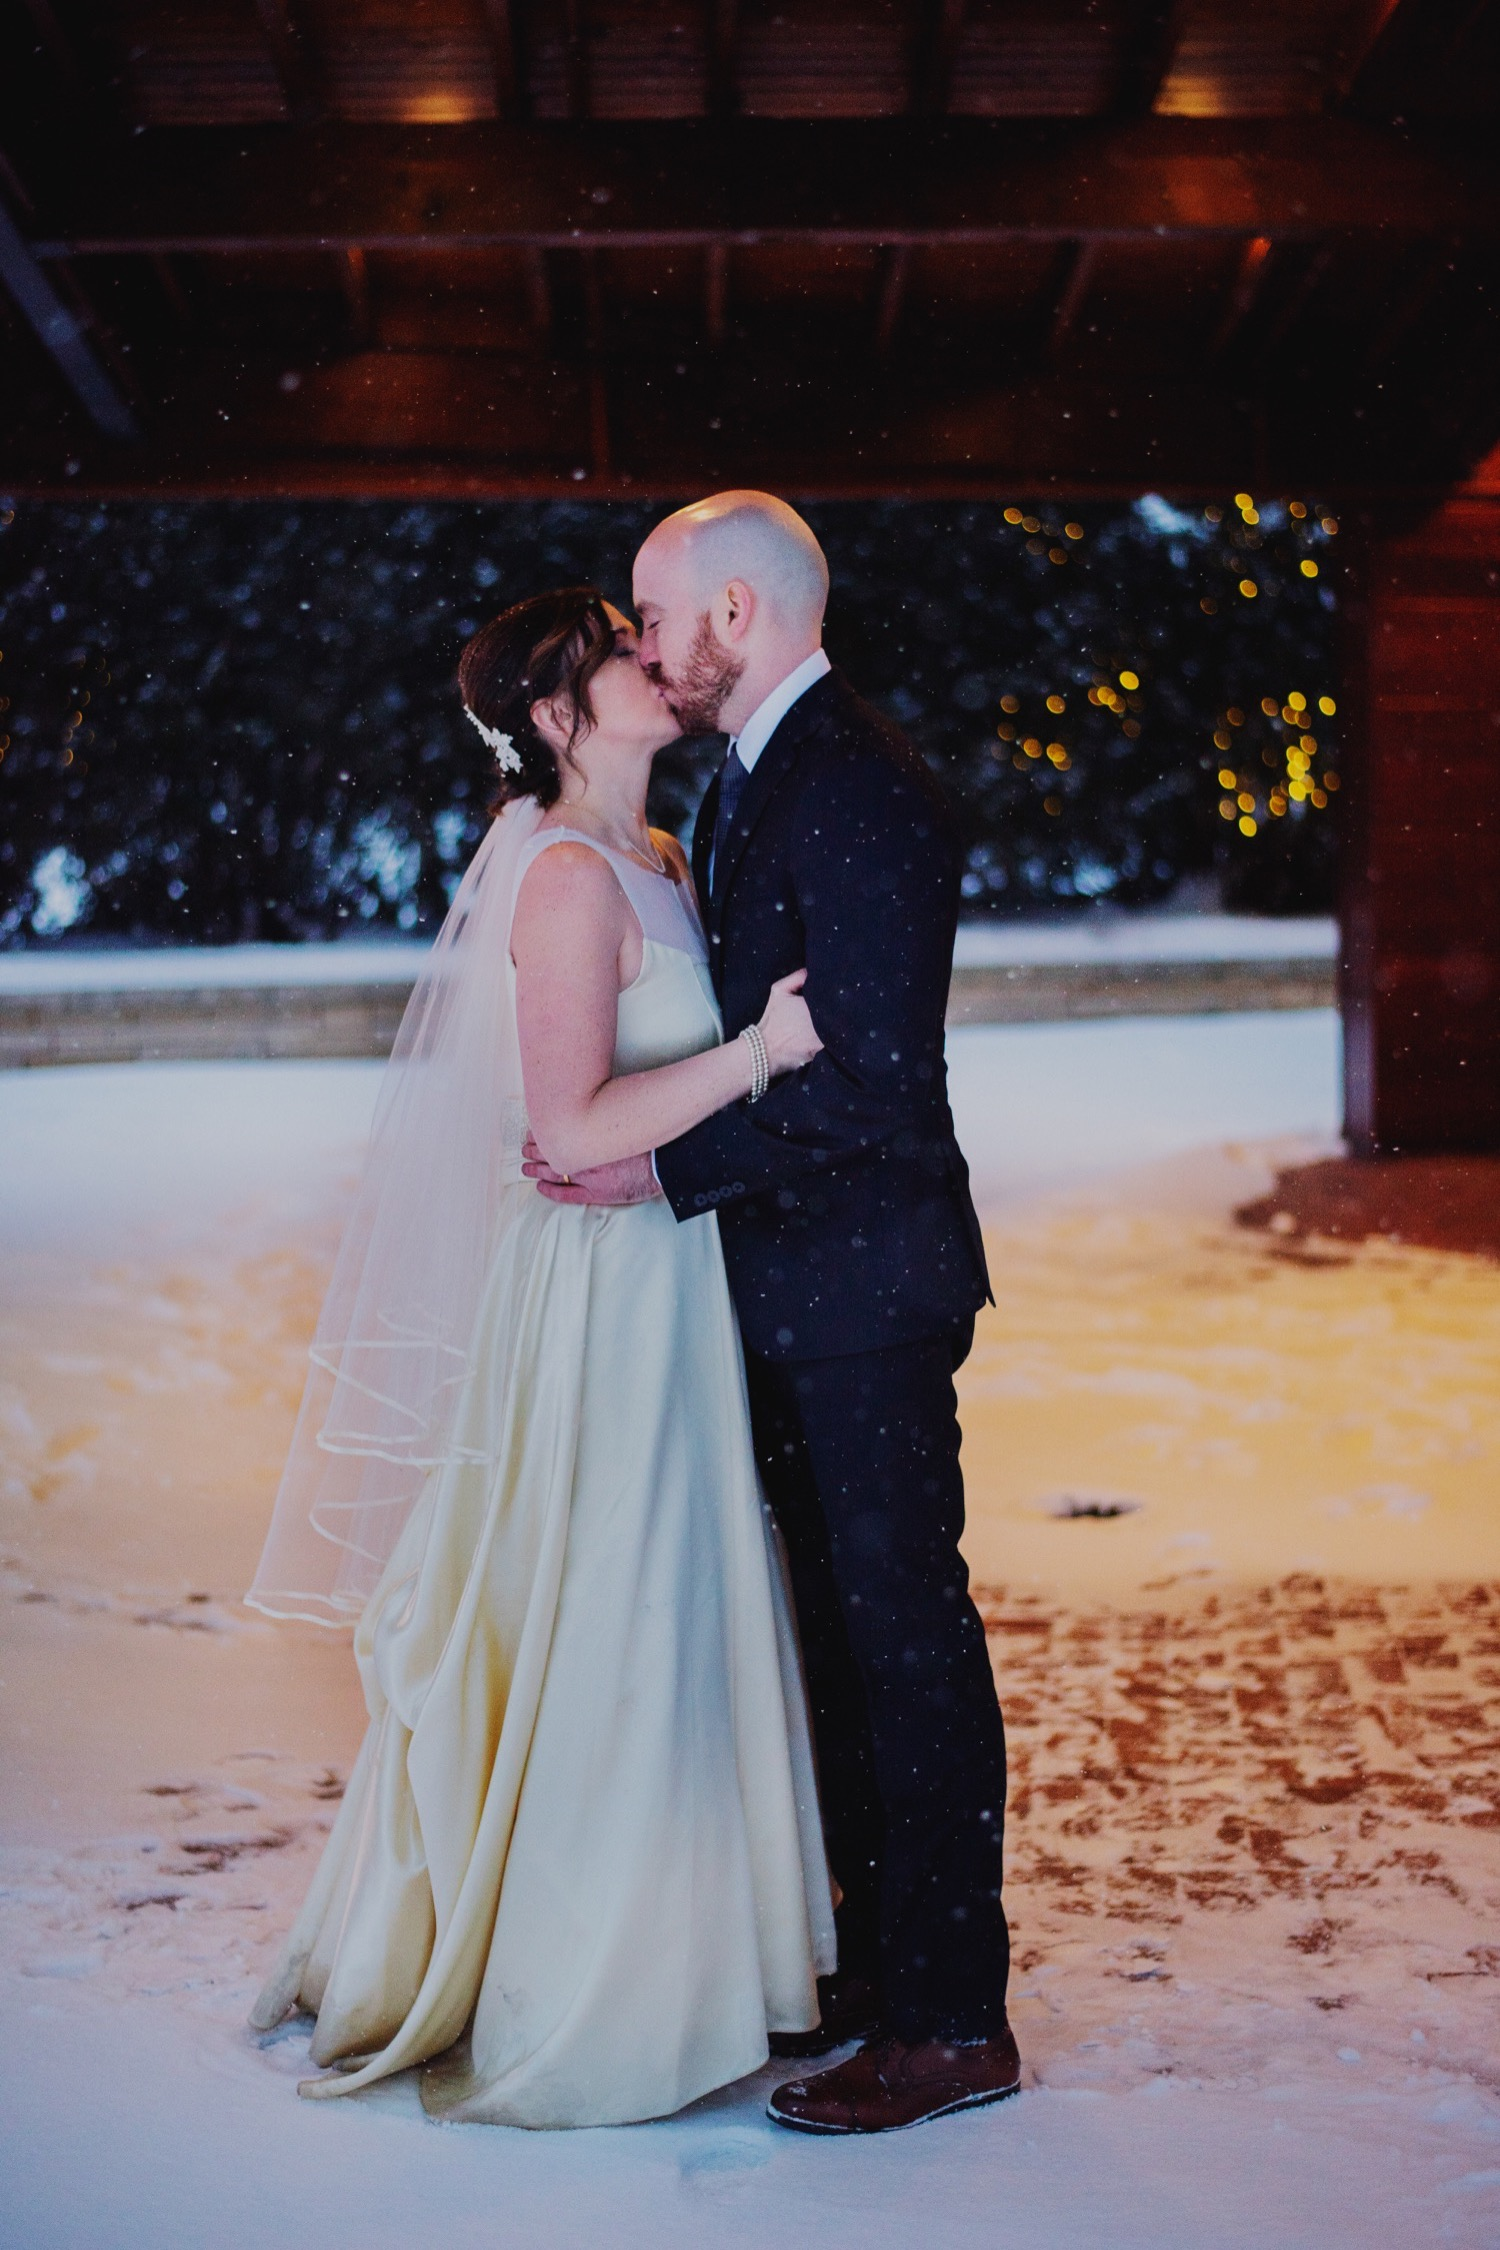 066_McGrath-Libertyville-IndependenceGrove-Winter-Wedding_0094_Independencegrovewedding.jpg